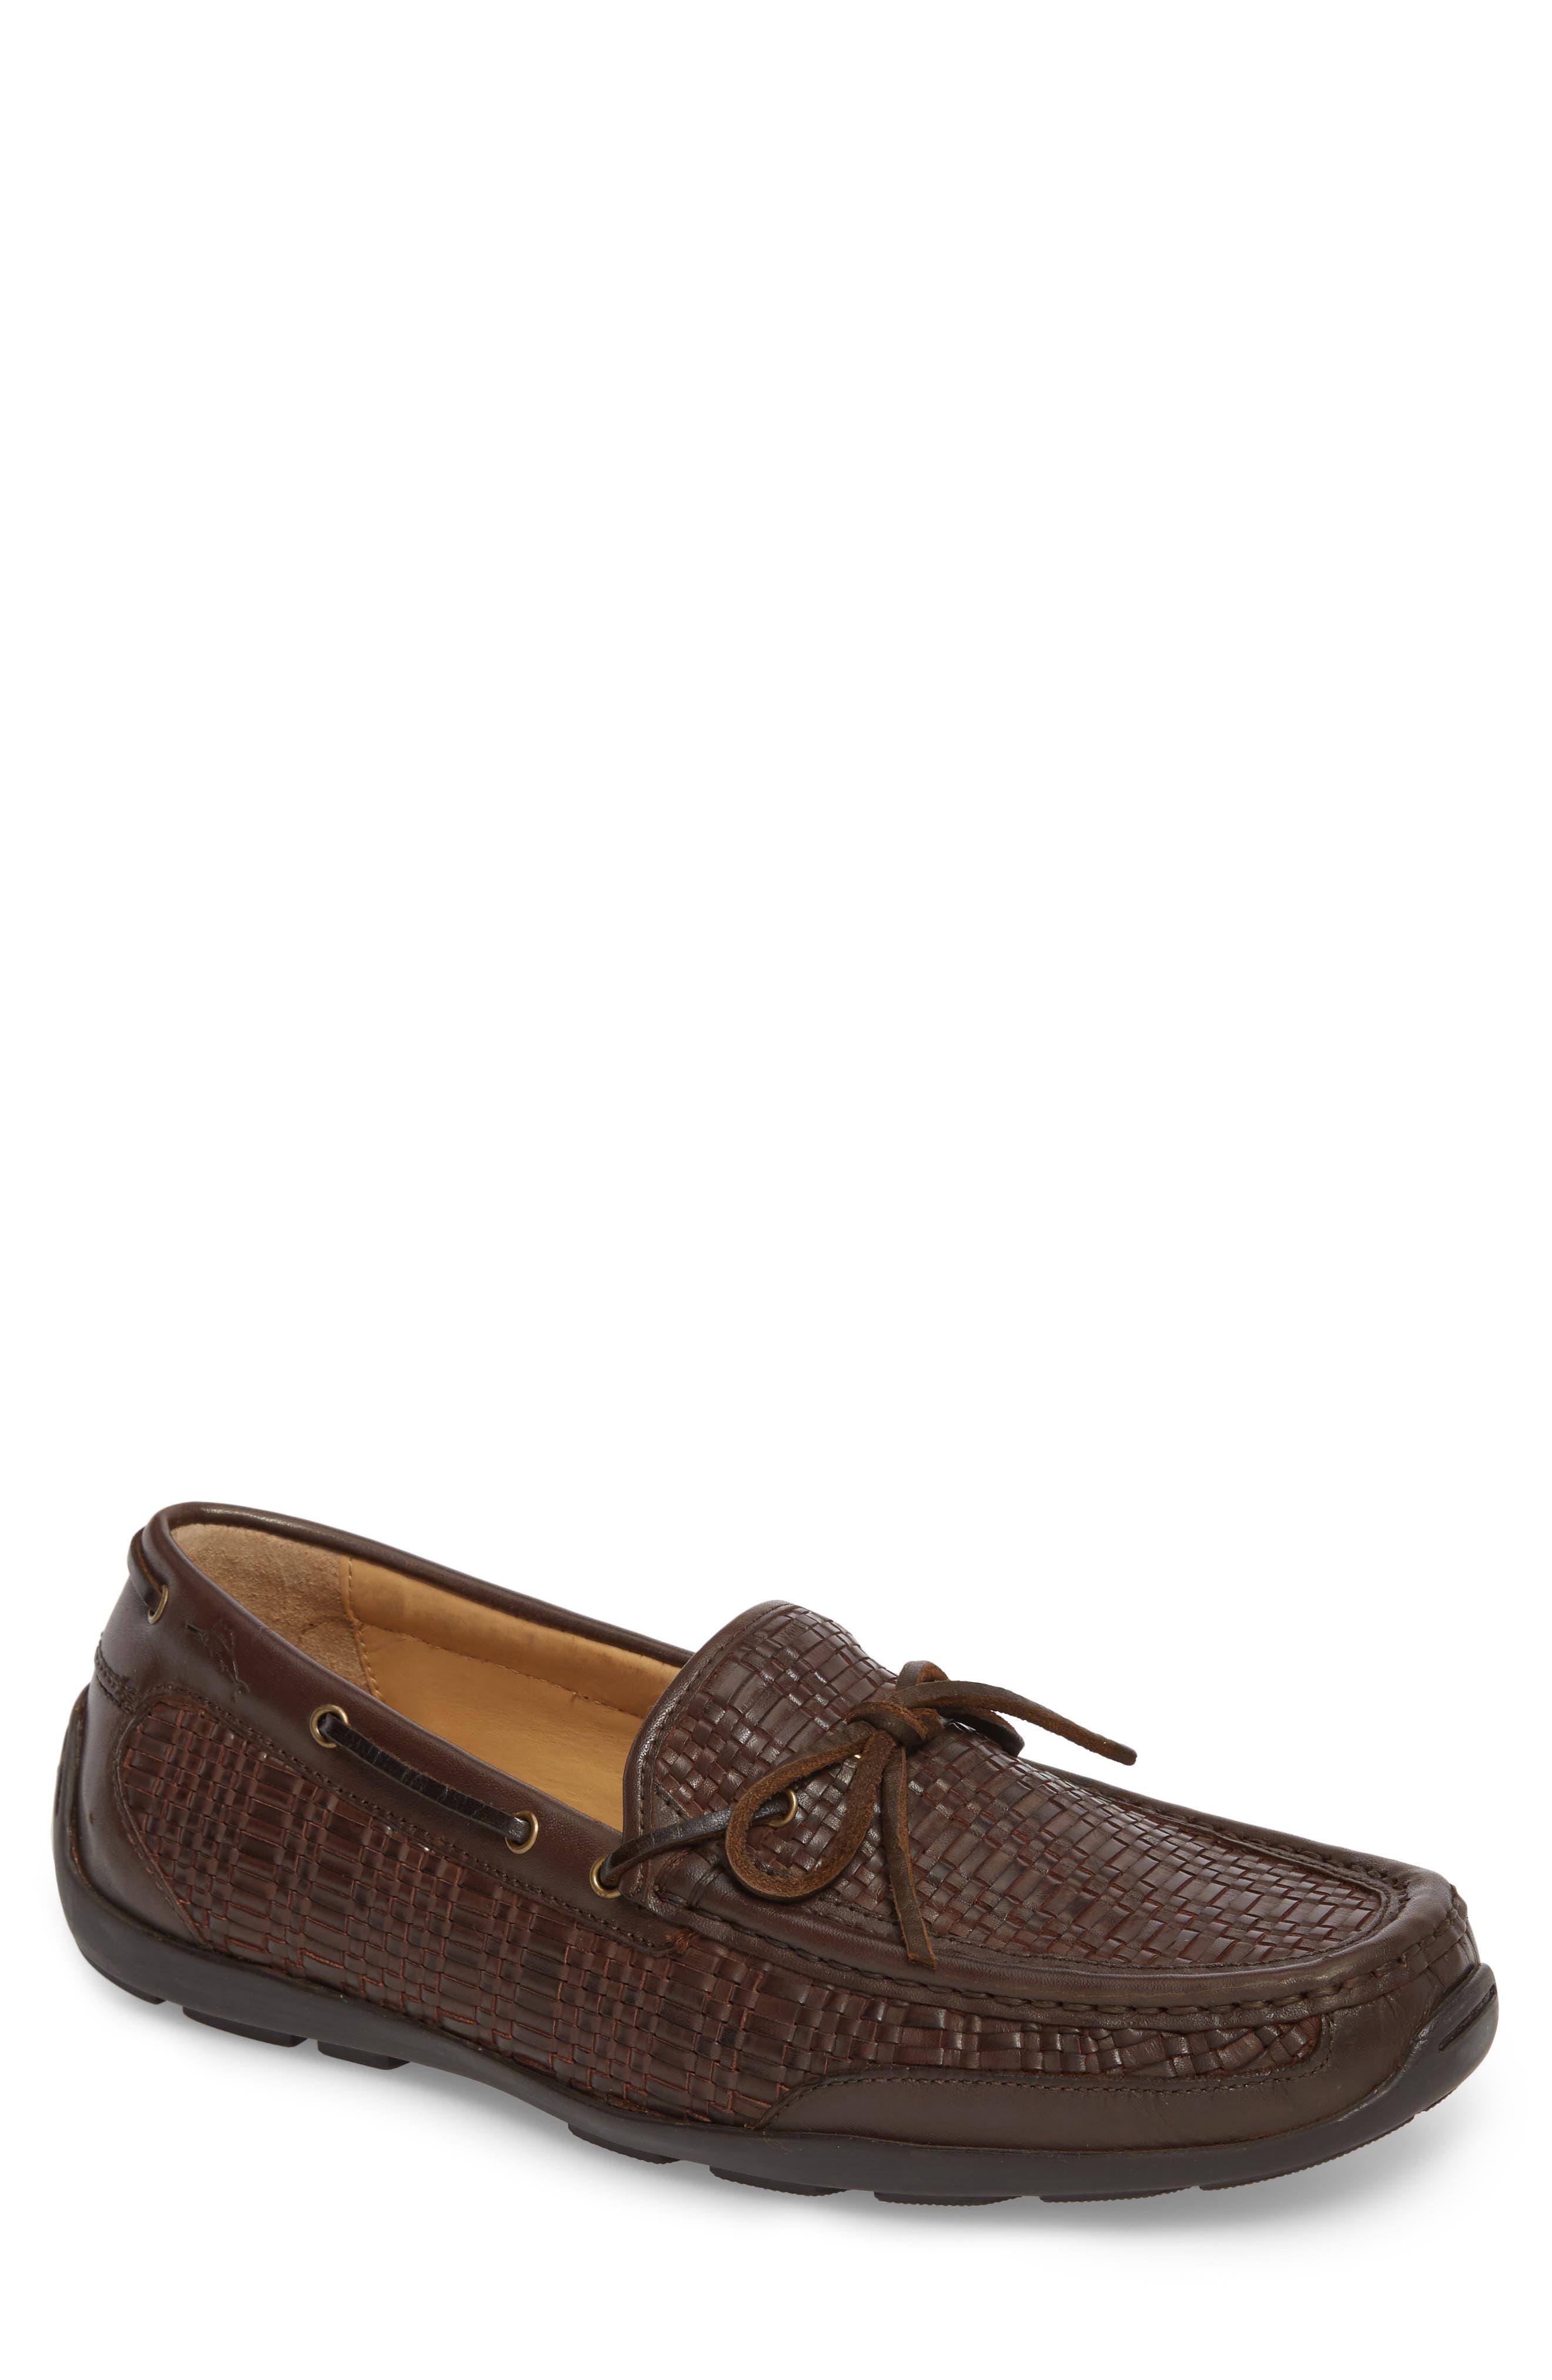 Alternate Image 1 Selected - Tommy Bahama Tangier Driving Shoe (Men)